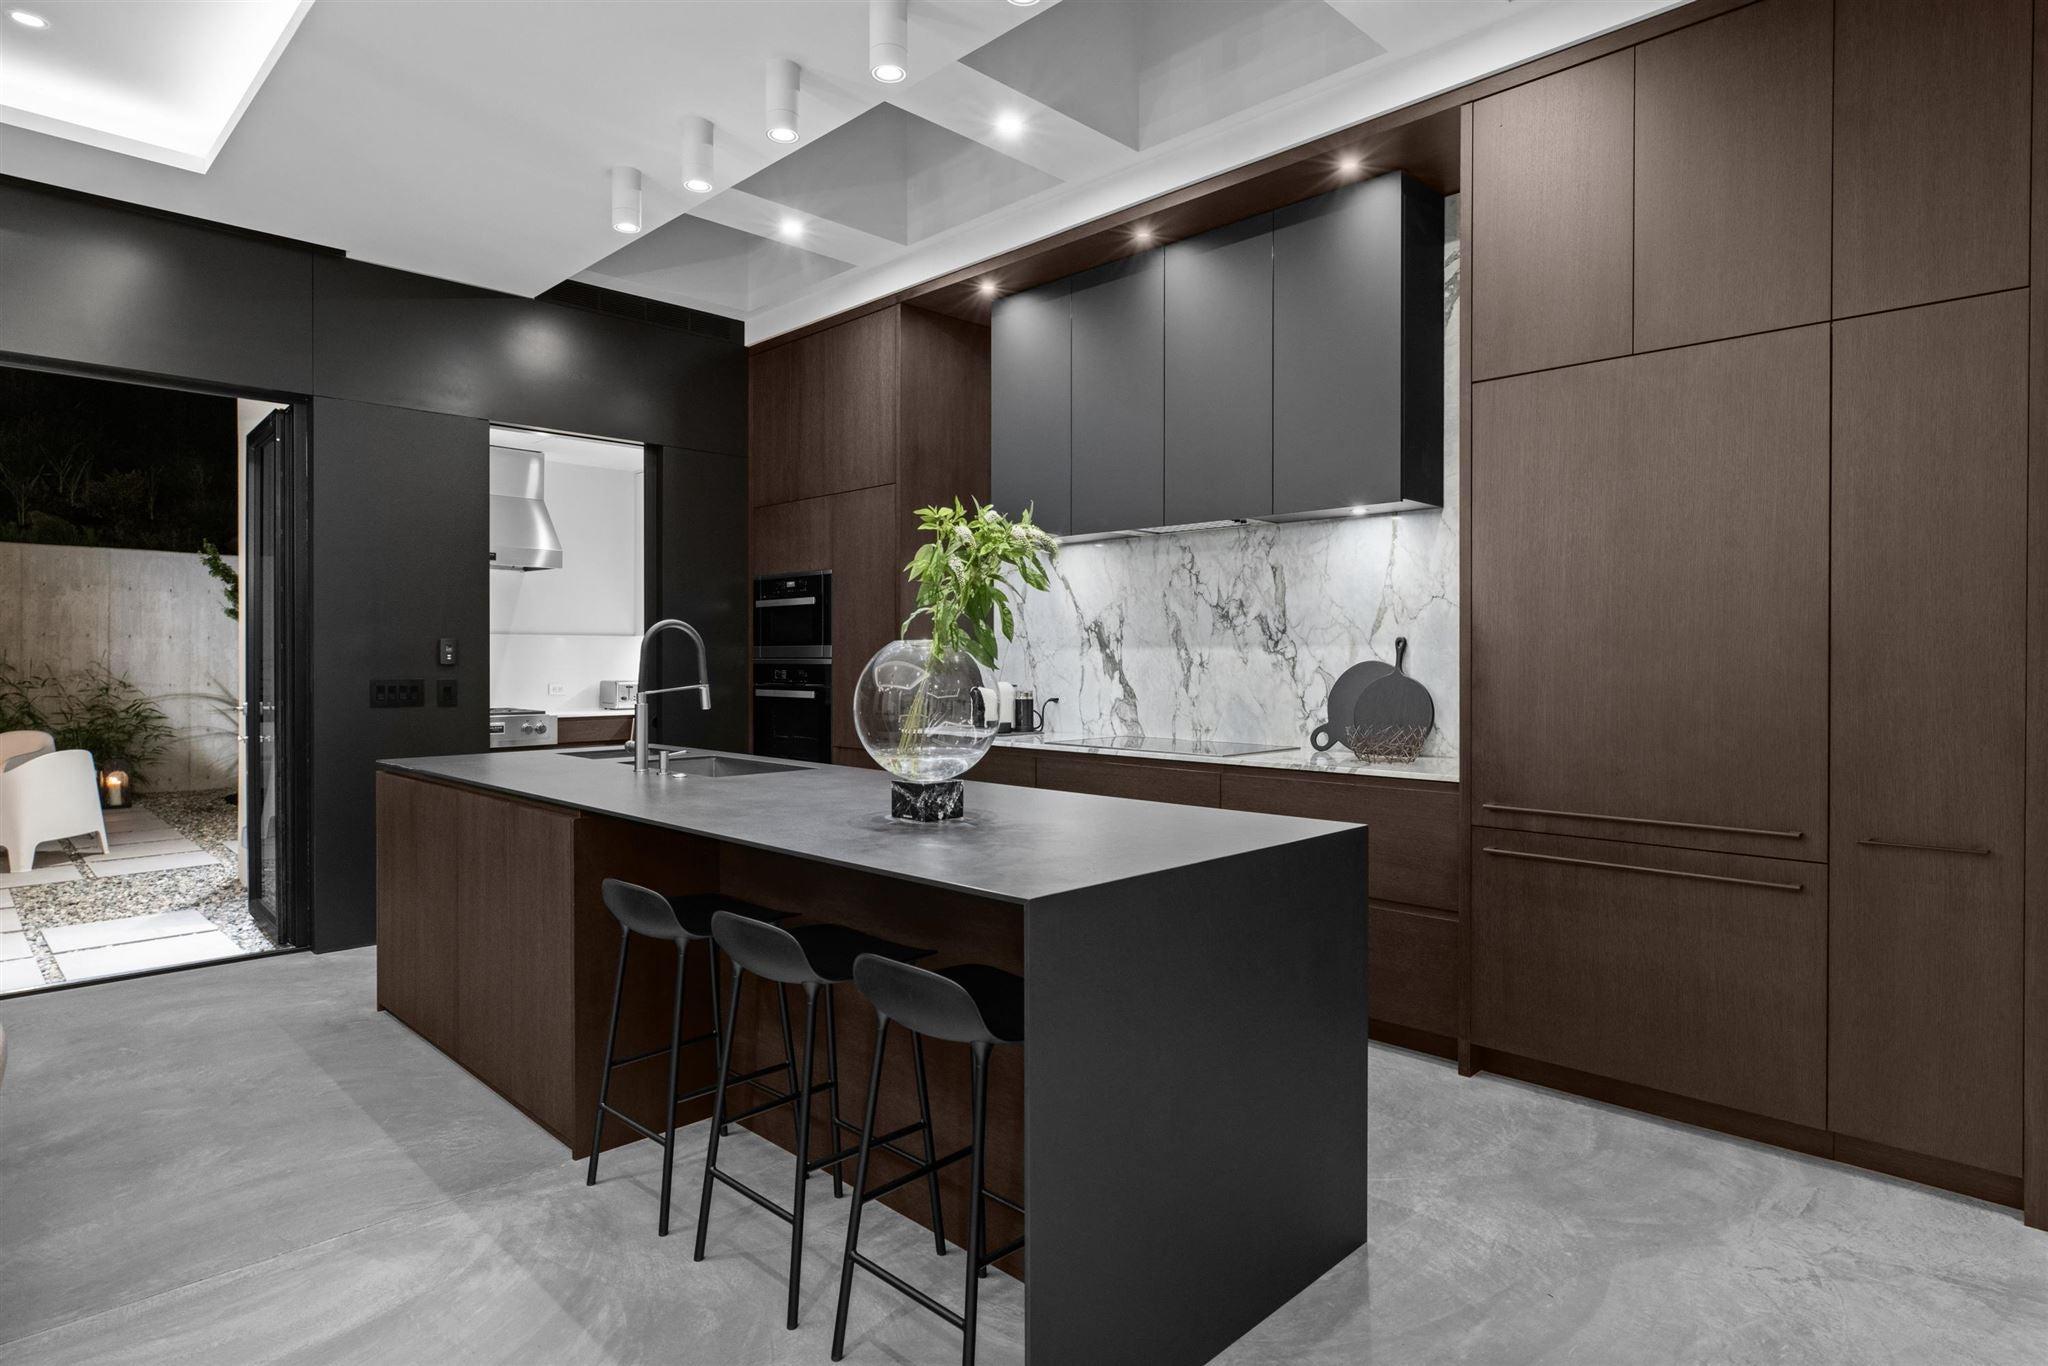 276 SANDRINGHAM CRESCENT - Upper Lonsdale House/Single Family for sale, 7 Bedrooms (R2617703) - #12